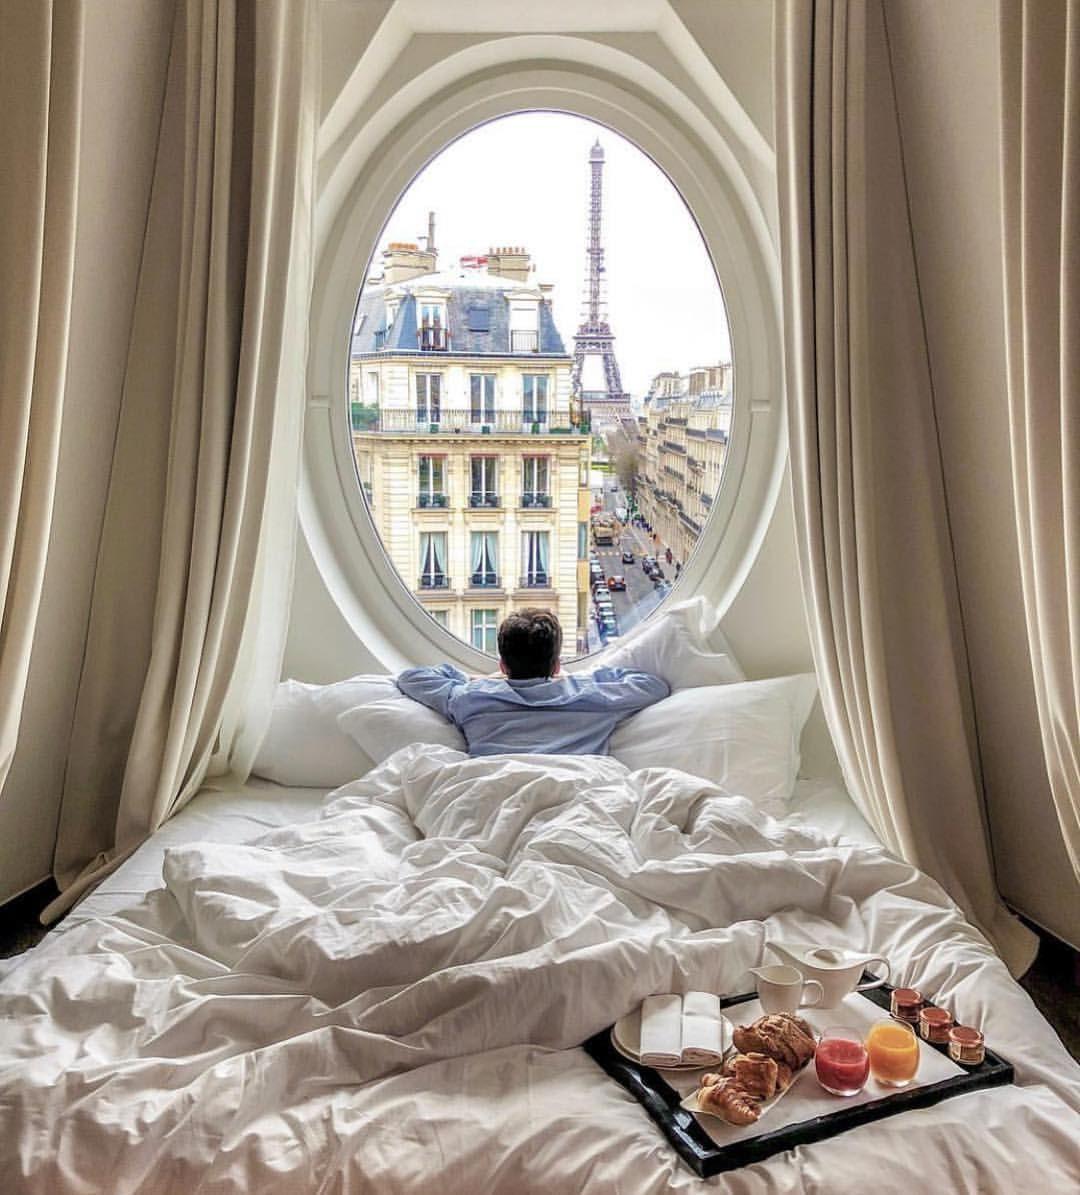 Breakfast in Paris 🇫🇷 @followthenap sleeps in all the best places #thegoodlifeinc